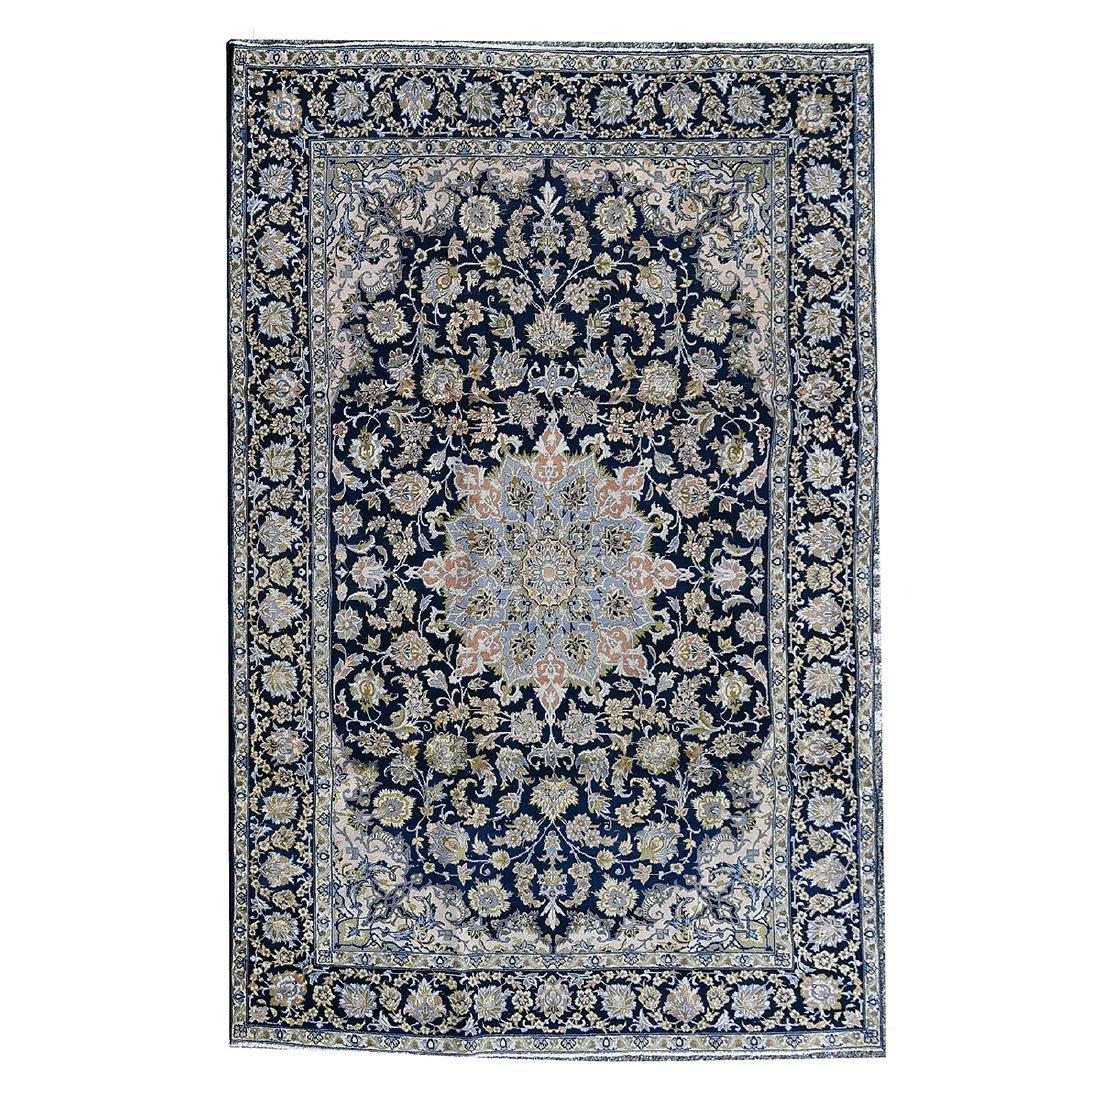 Tabriz Carpet (Cobalt Blue Ground)